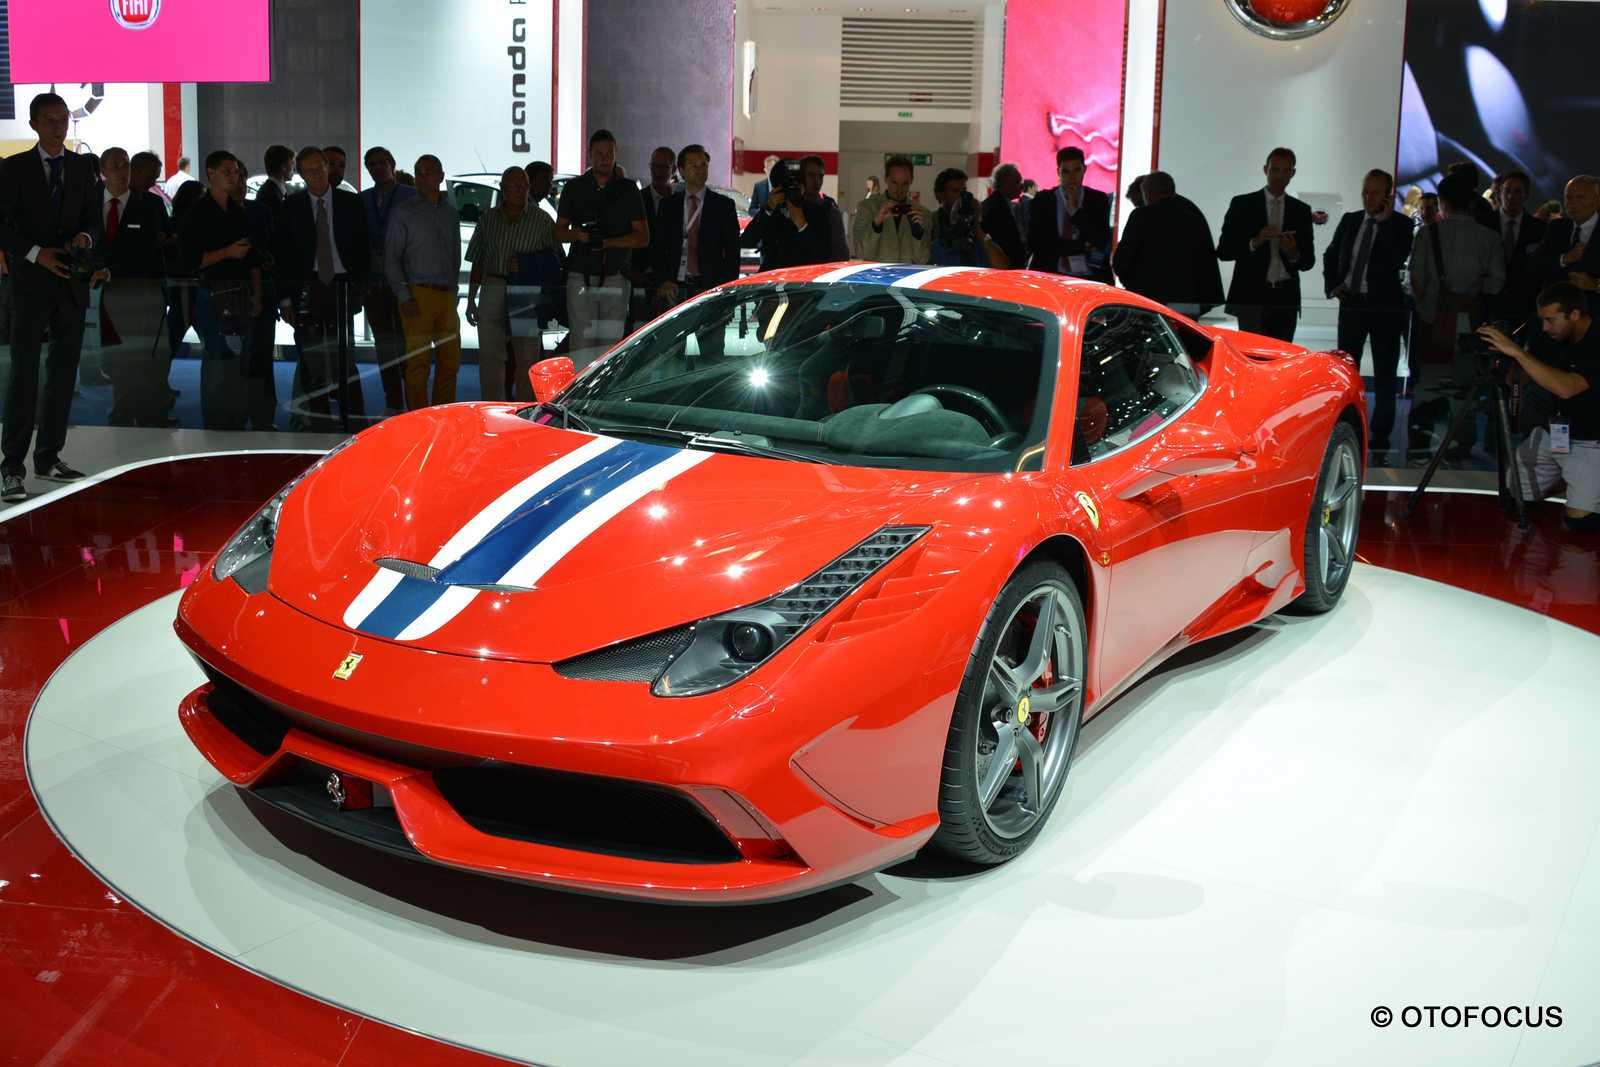 2013-Frankfurt-Motor-Show-Ferrari 458 Speciale 4